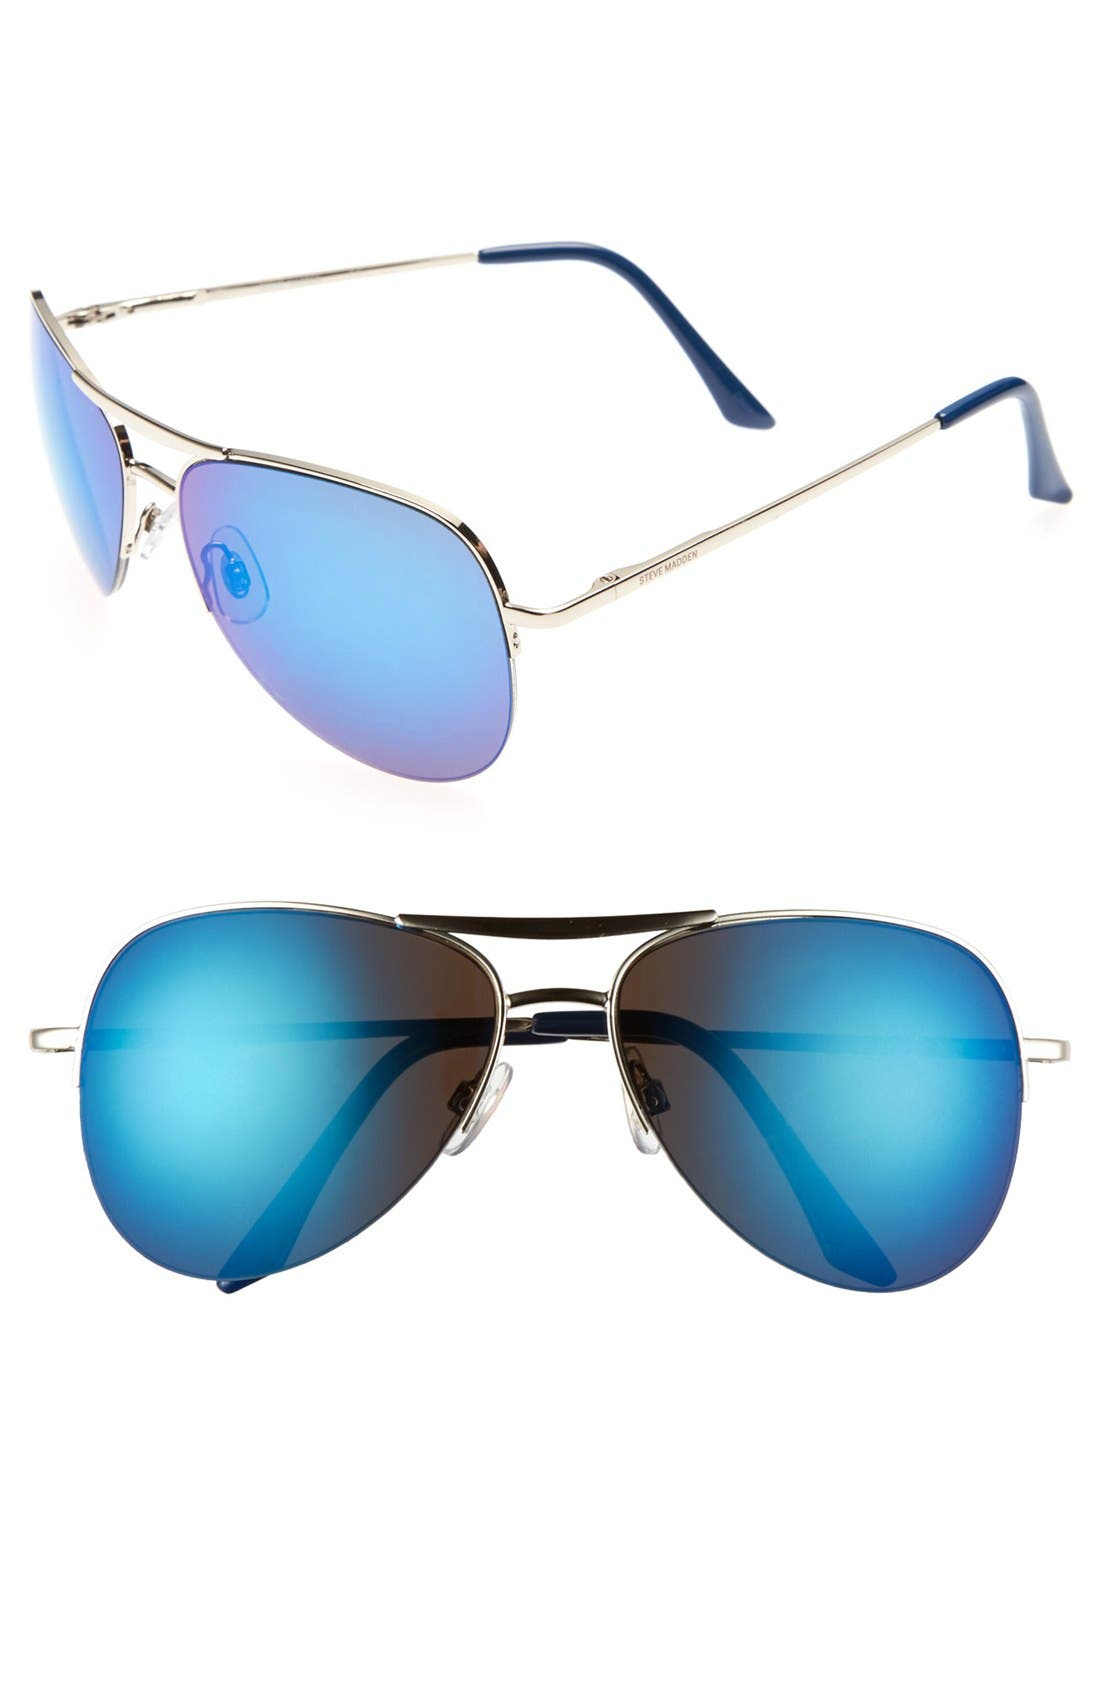 Main Image - Steve Madden 60mm Aviator Sunglasses